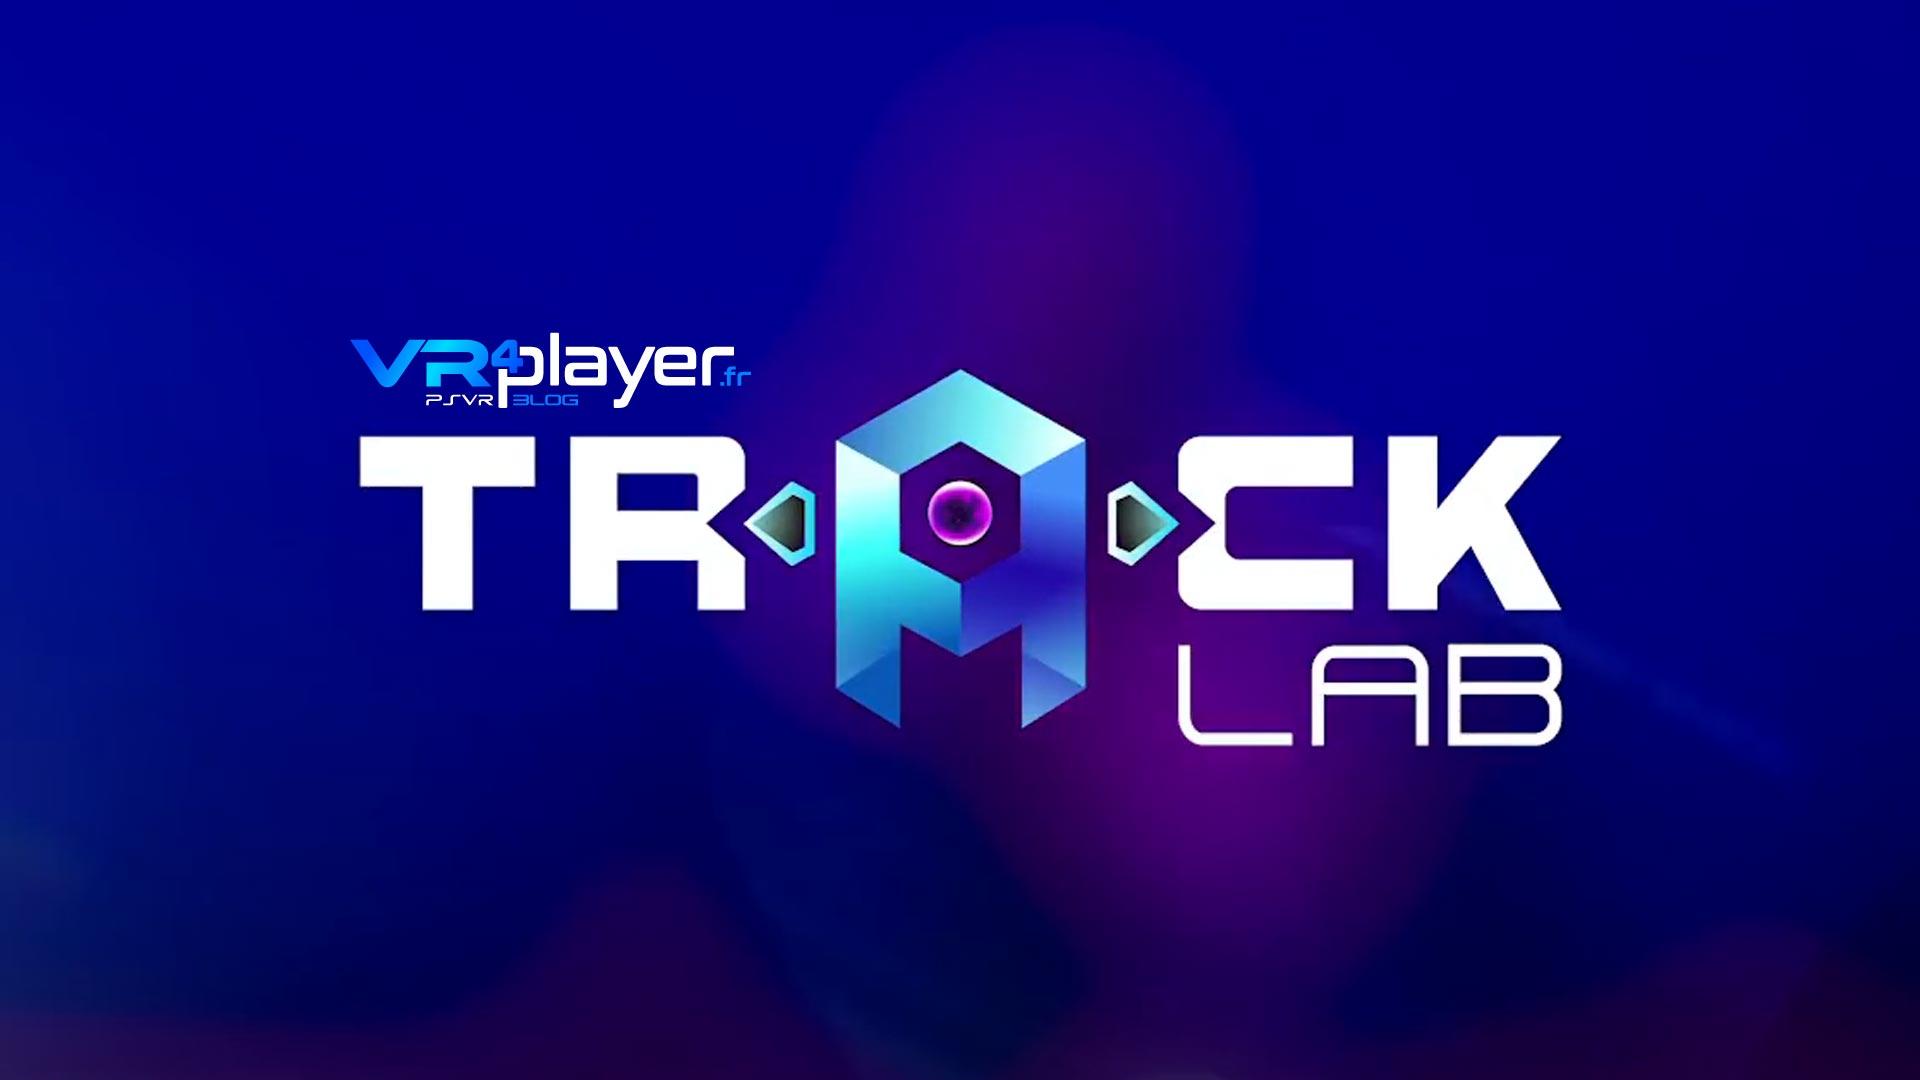 Track Lab donne sa date de sortie sur PSVR vr4player.fr